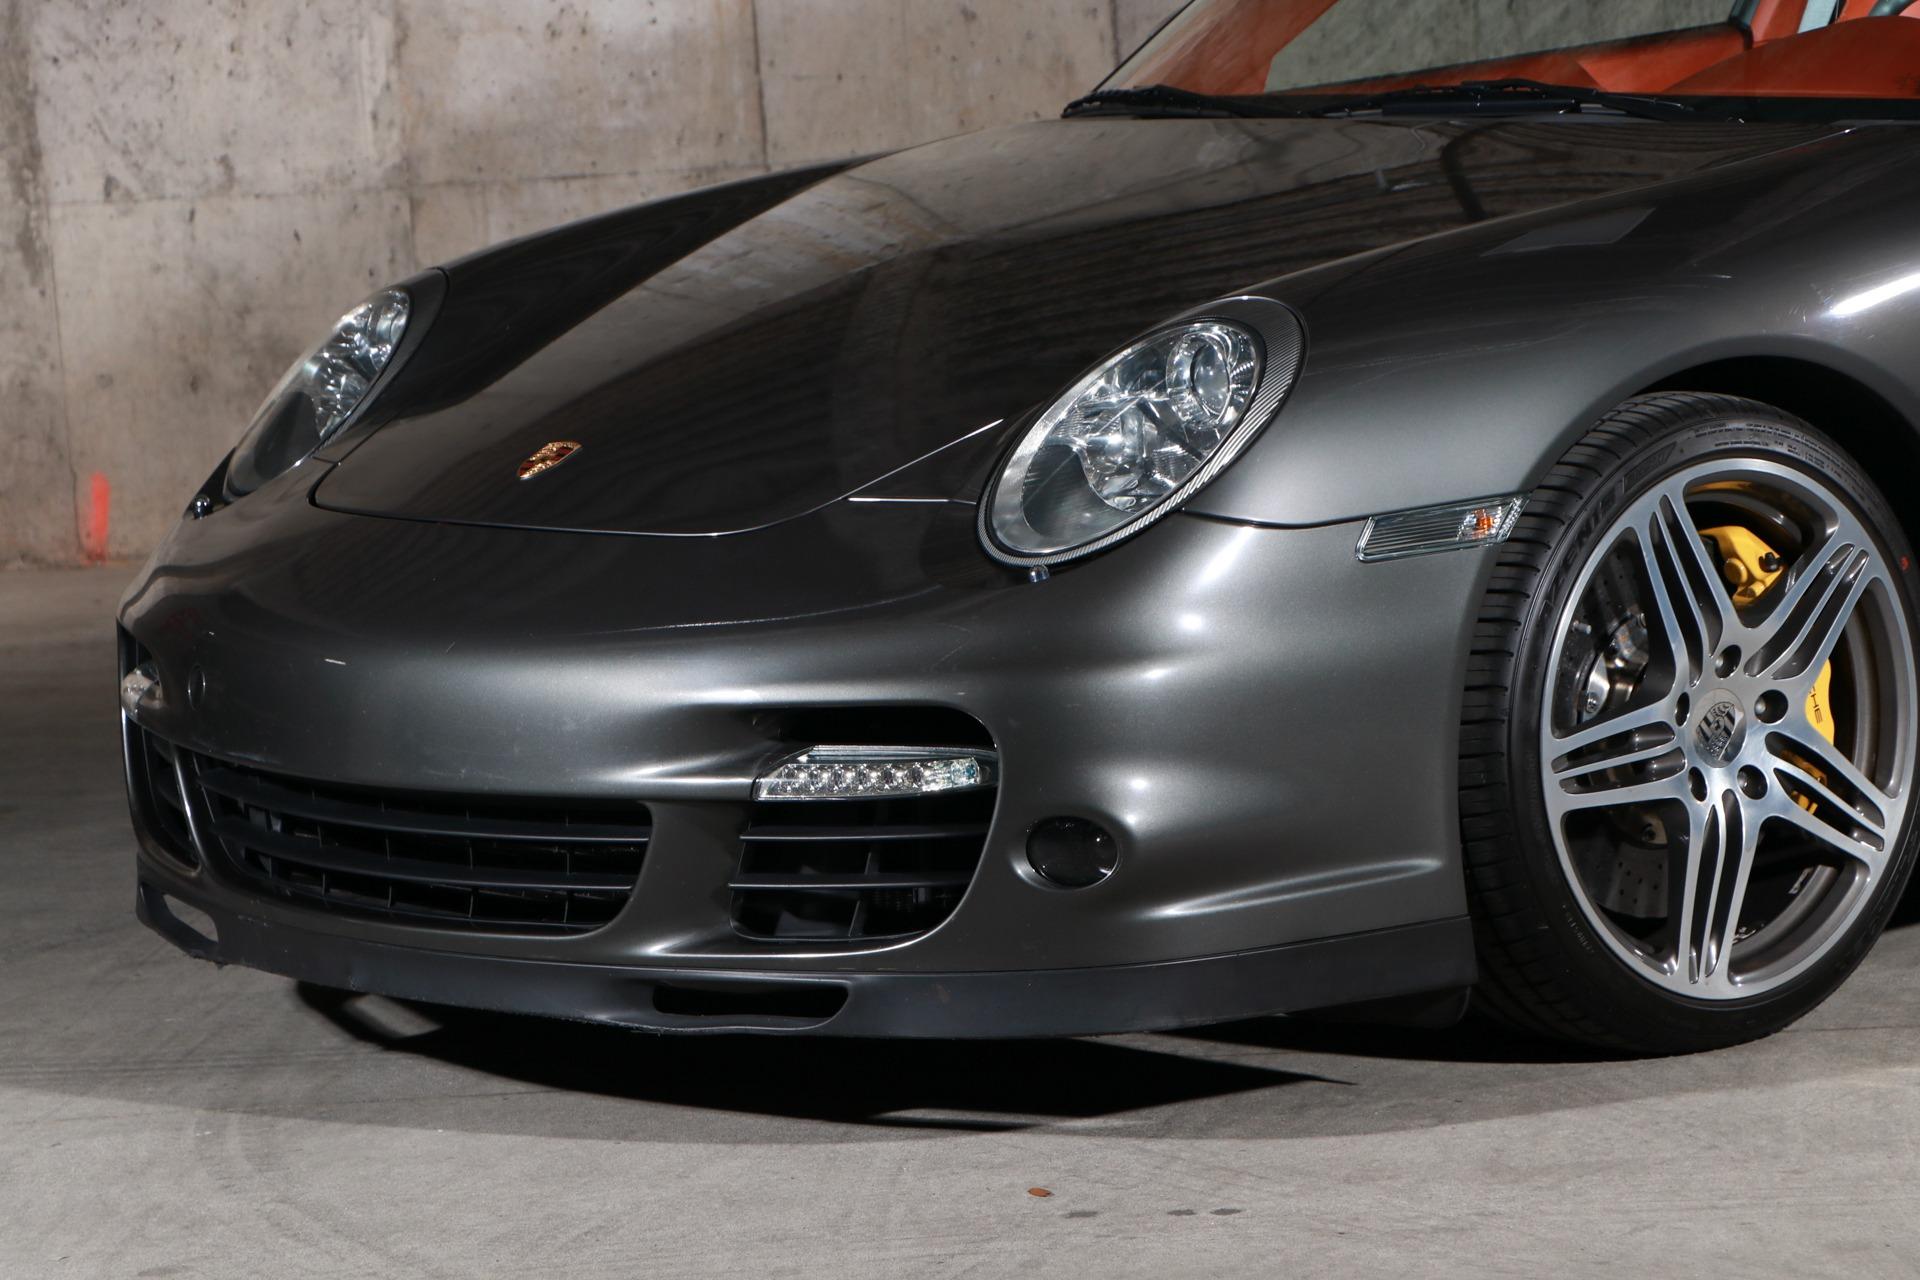 Used 2007 Porsche 911 Turbo   Glen Cove, NY